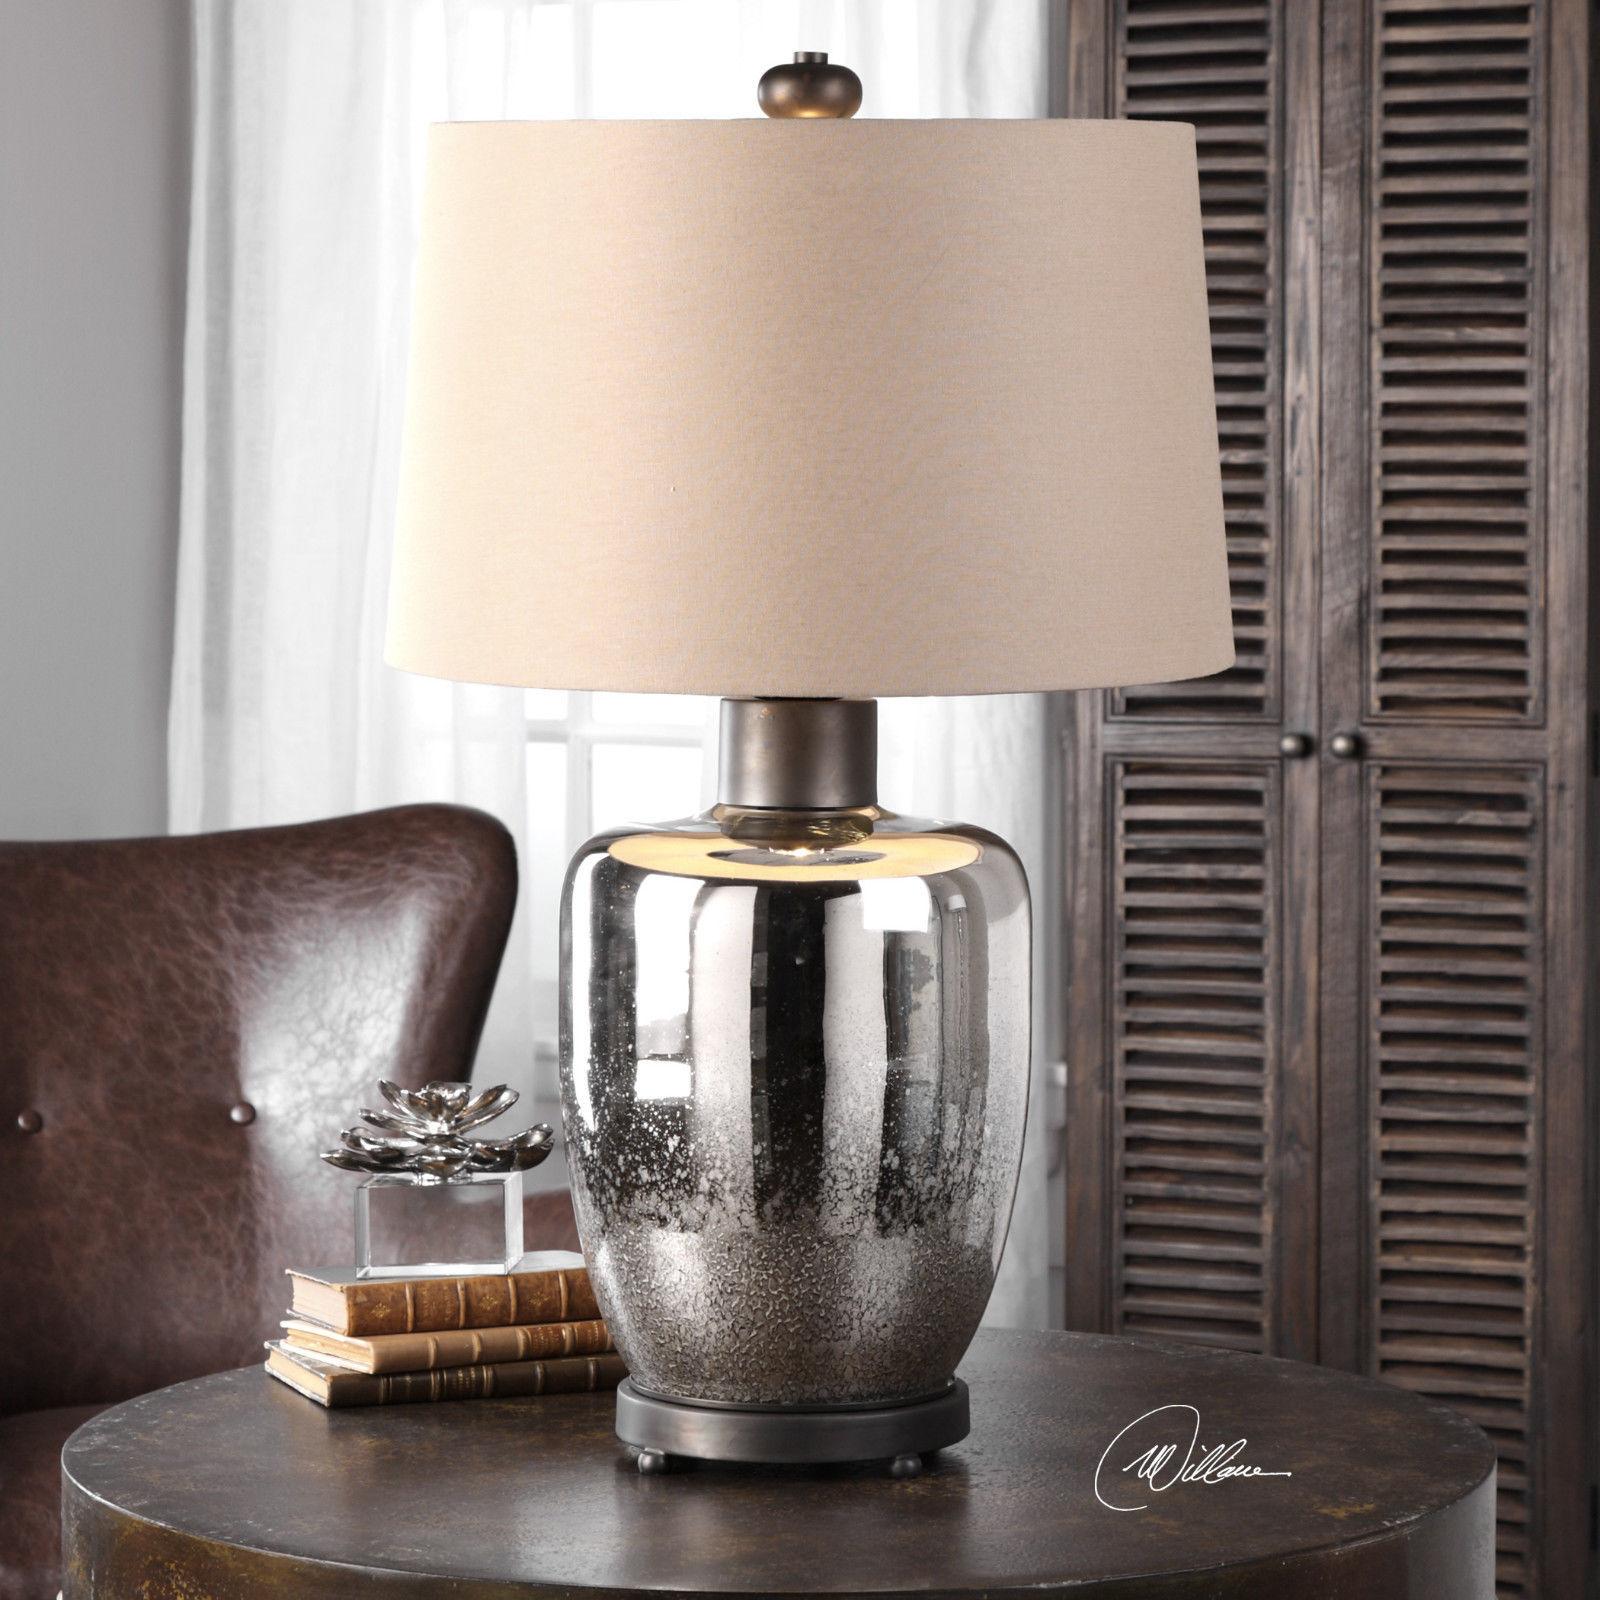 "DESIGNER 32"" AGED MERCURY GLASS TABLE LAMP OXIDIZED BRONZE METAL DETAIL LIGHT"